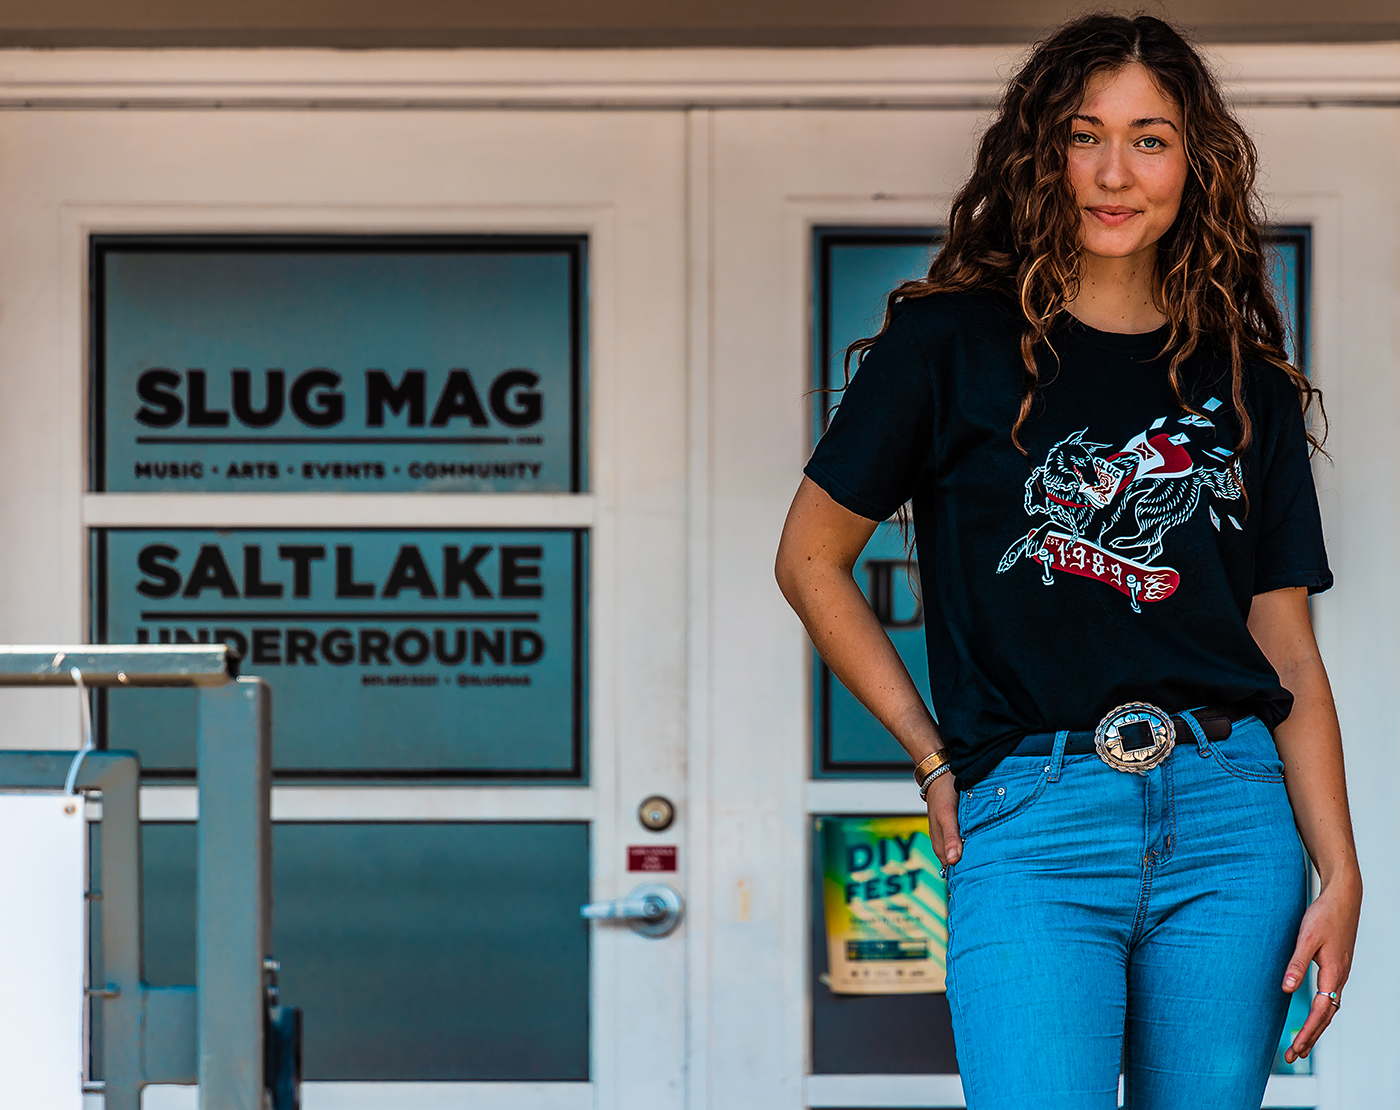 For SLUG's T-shirt design contest, Halley Bruno's interpretation of SLUG as a skateboarding dog won, but her artistic love began earlier.